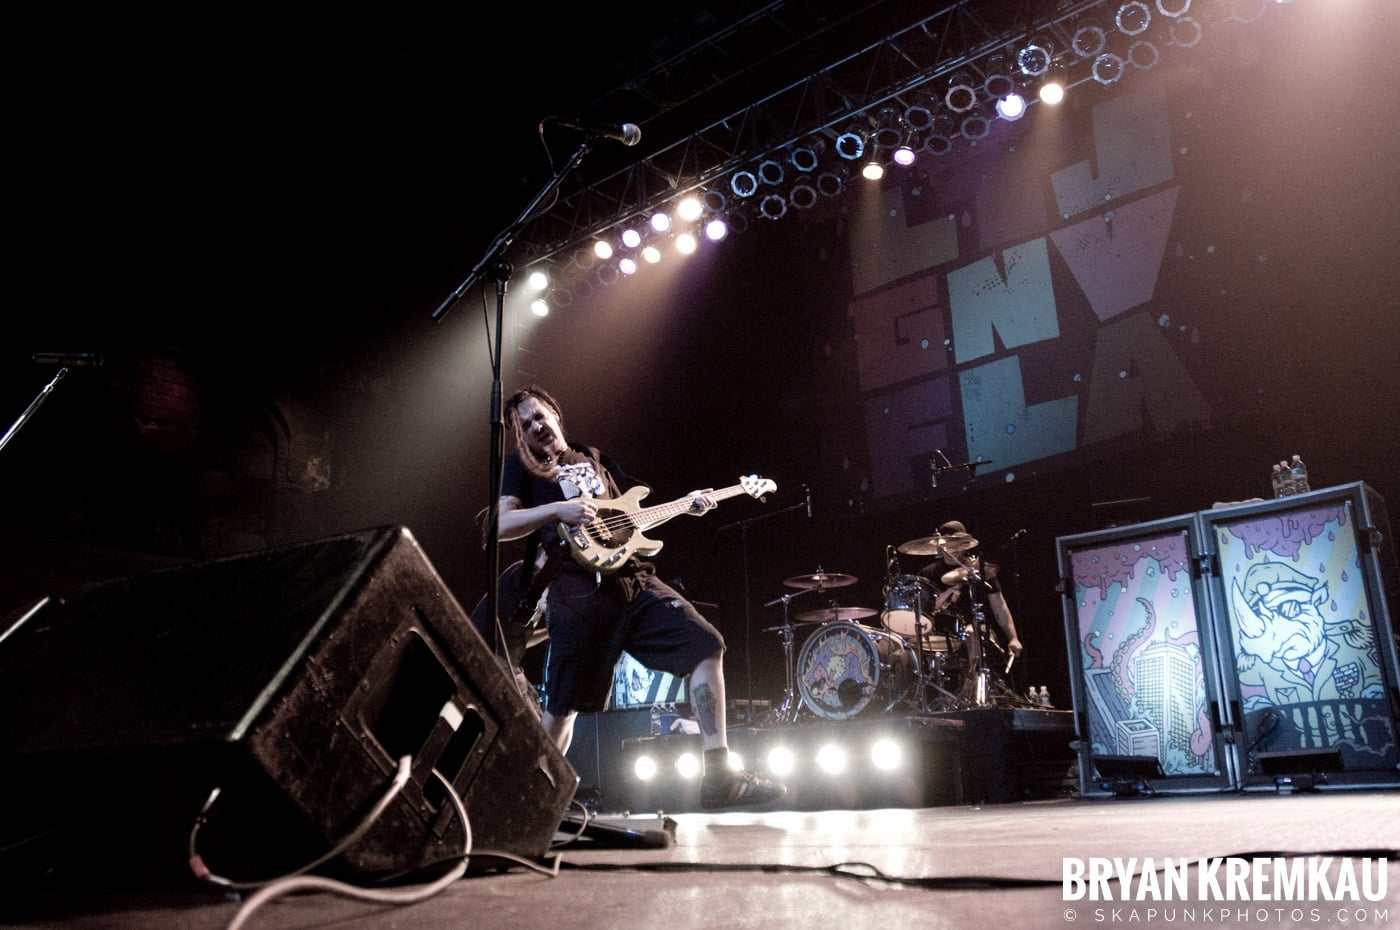 Less Than Jake @ Roseland Ballroom, NYC - 6.26.08 (5)